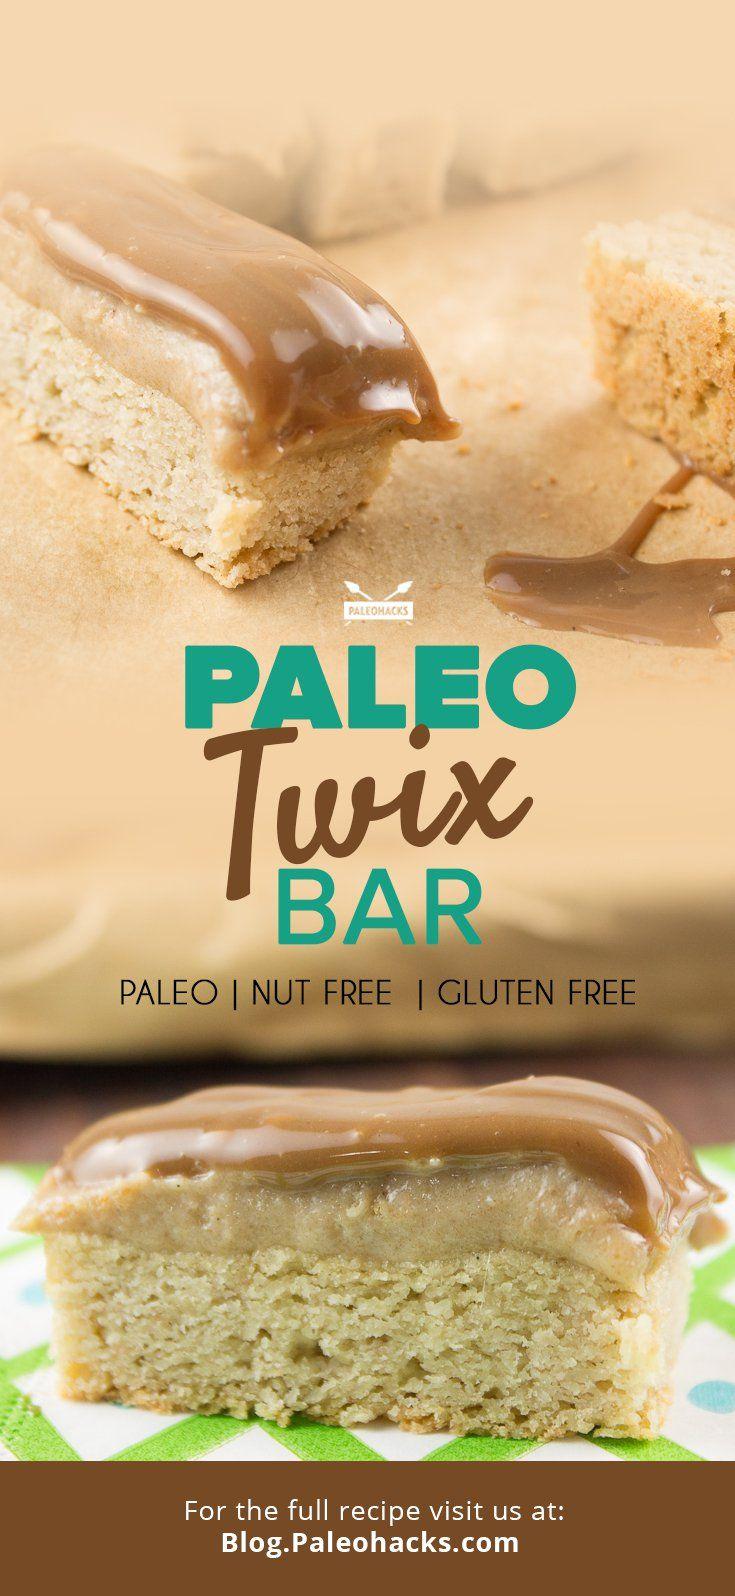 Paleo Twix Bar Recipe Coconut Flour Recipes Twix Bar Paleo